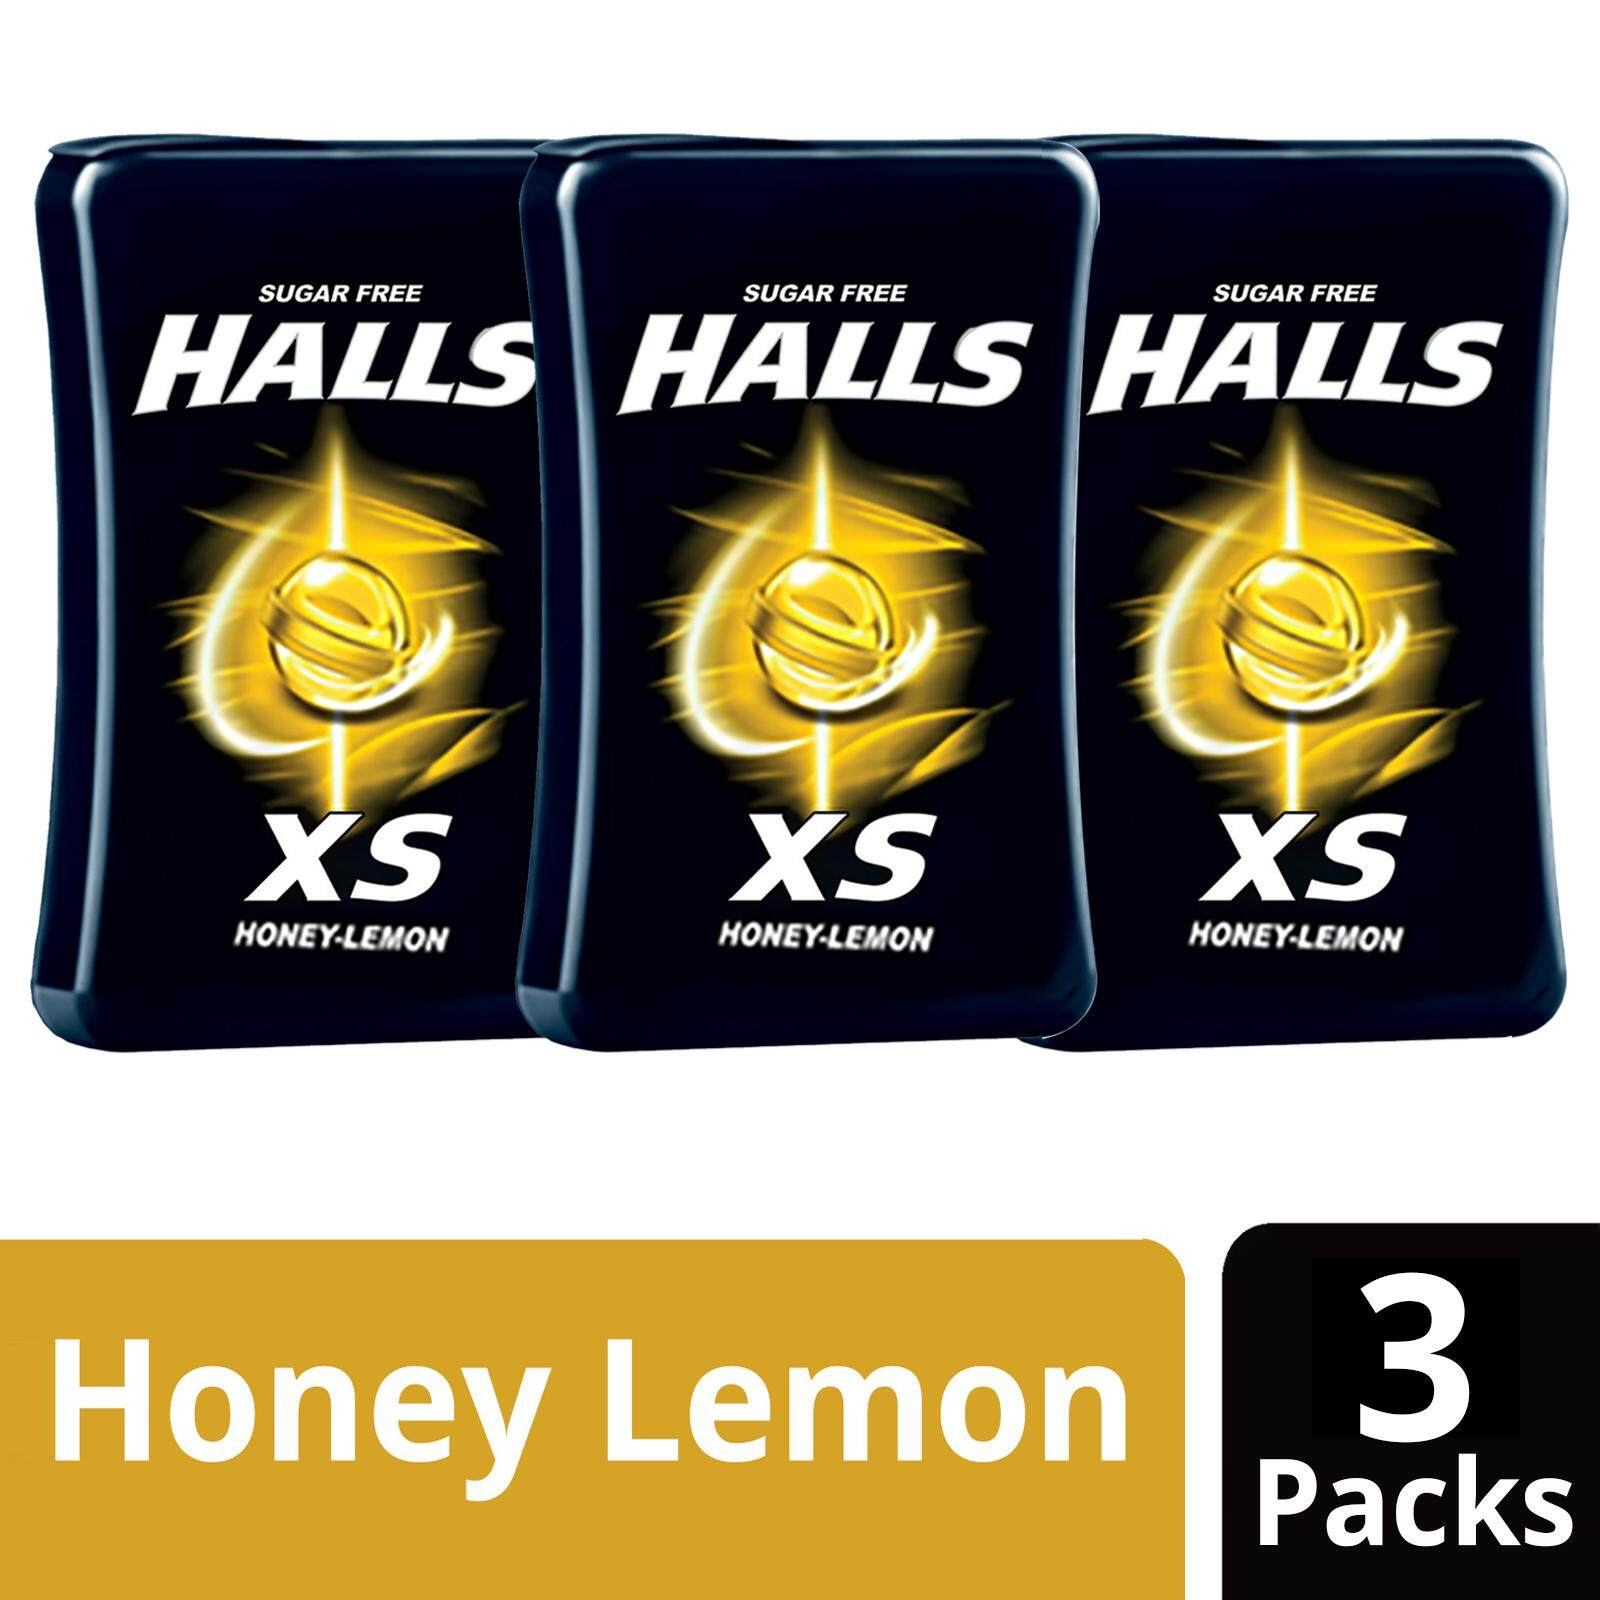 Halls XS Honey Lemon Sugar Free (25s X 3)